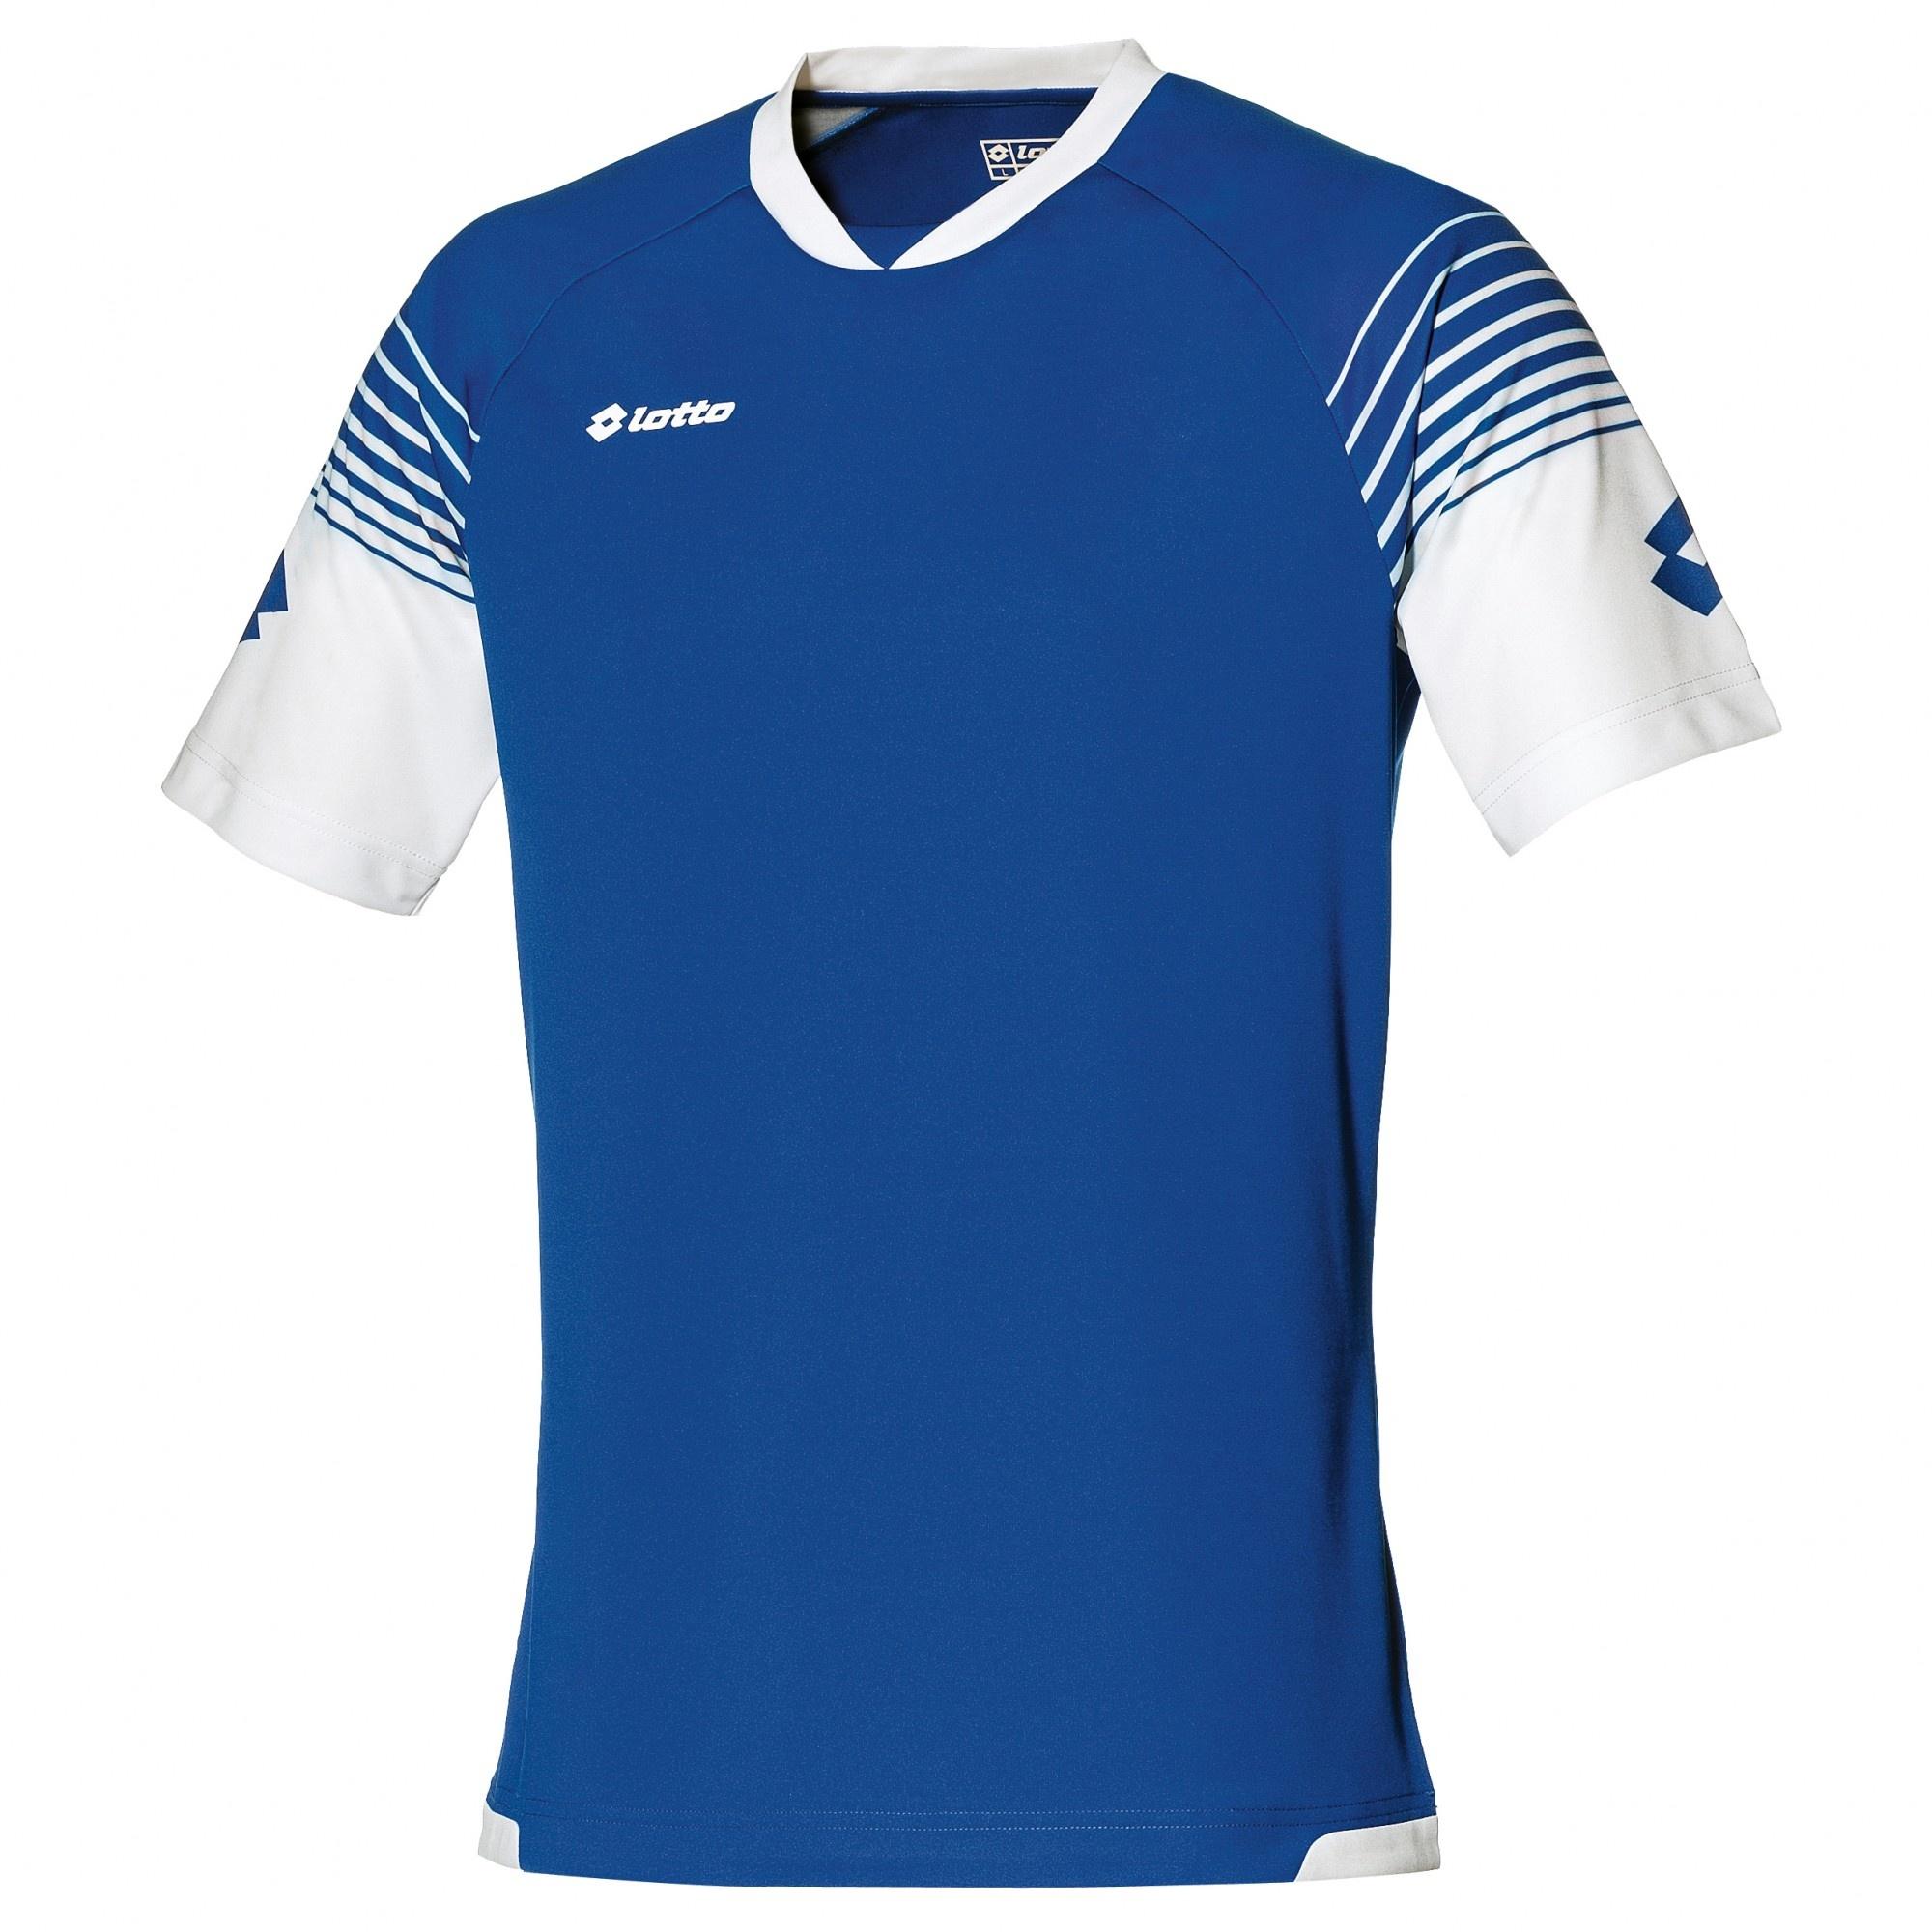 Lotto Mens Football Jersey Omega Sports T-Shirt | eBay